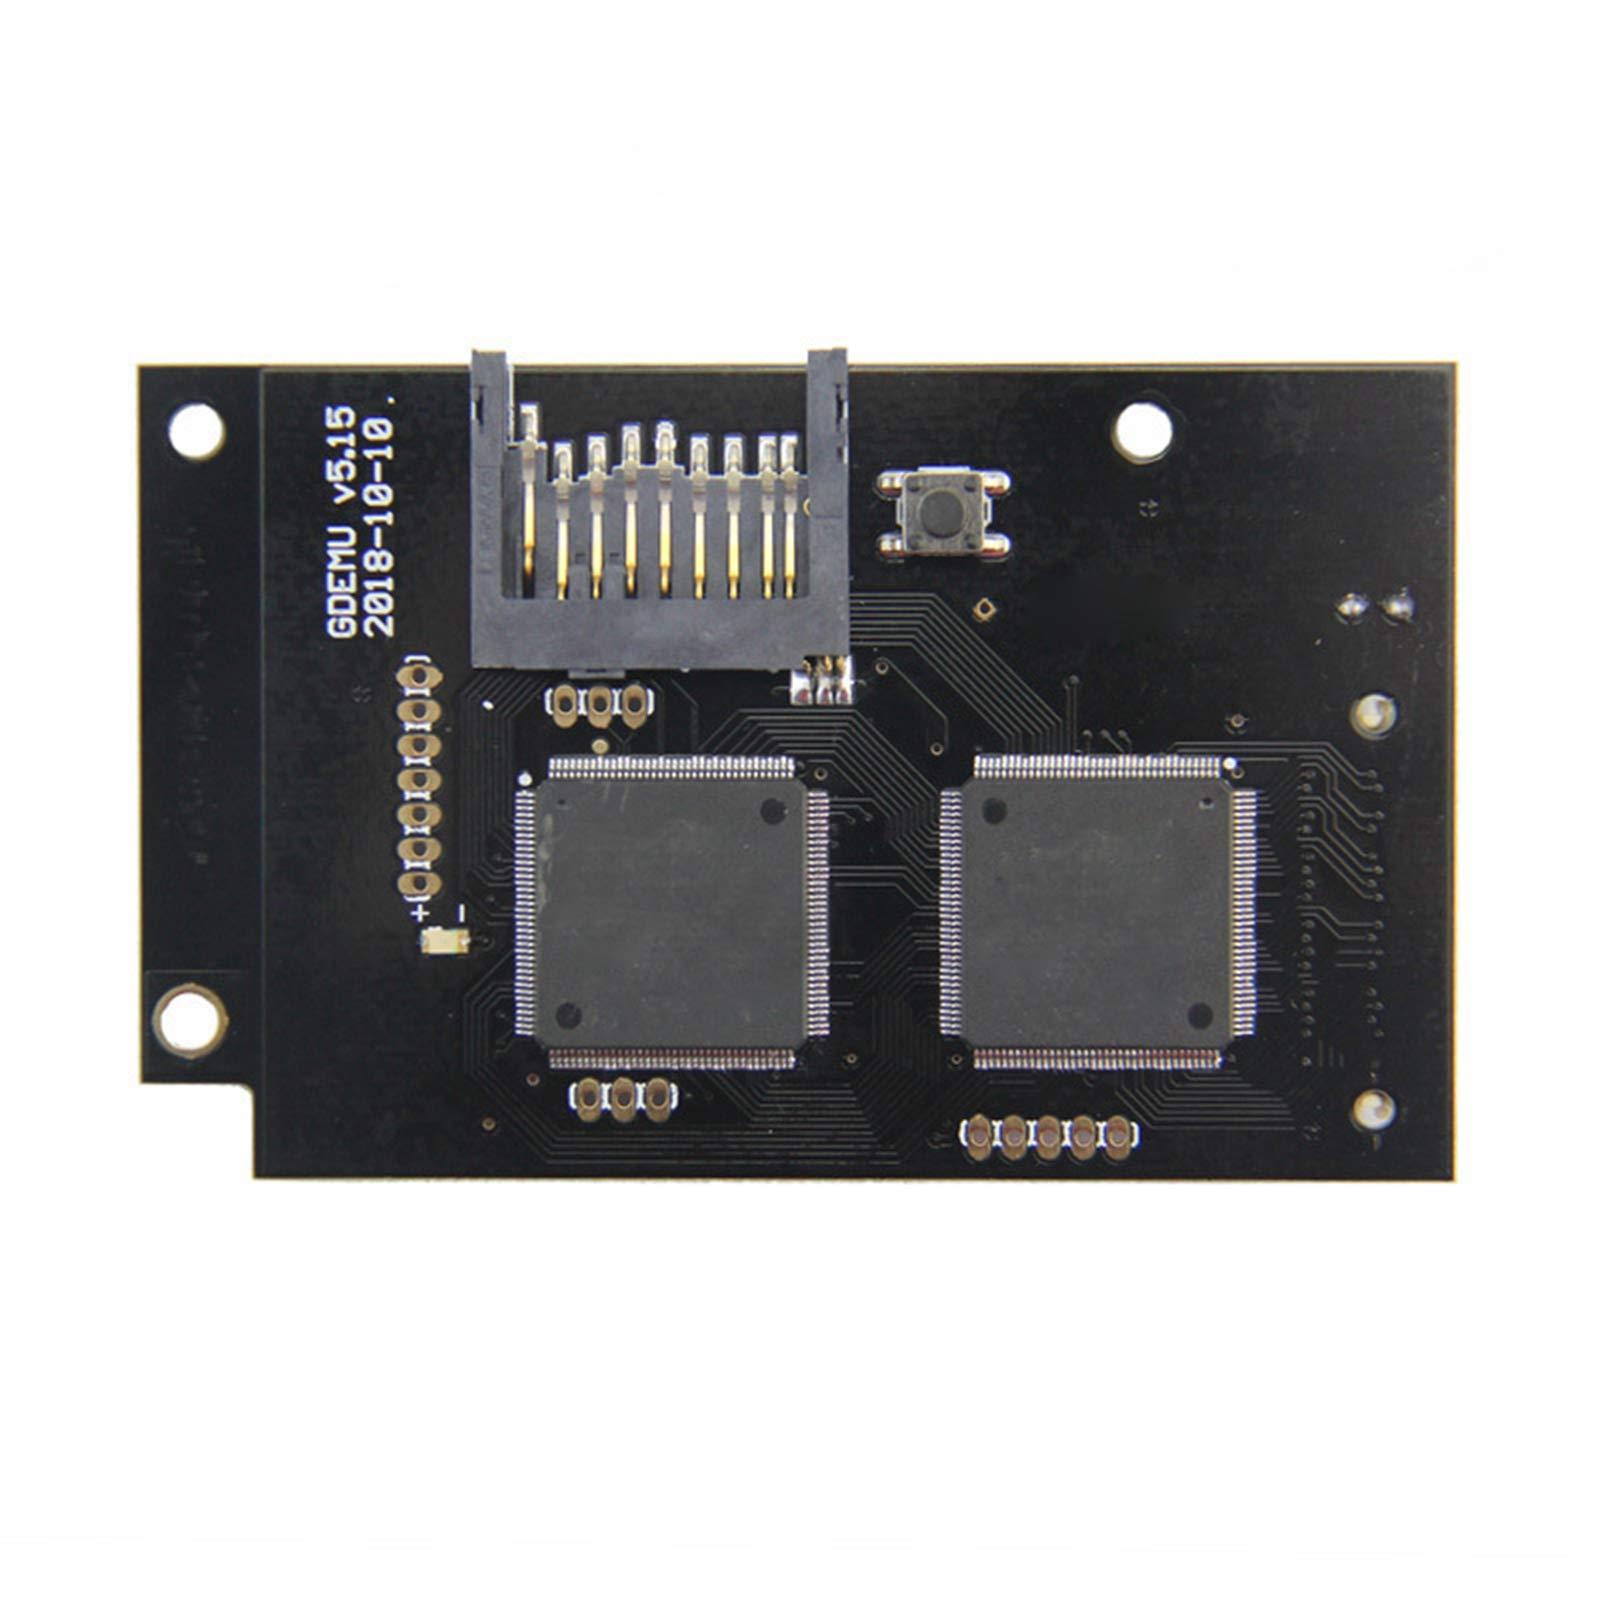 LICHIFIT Repair Part V5.15 GDEMU Optical Drive Simulation Board for SEGA Dreamcast Second Generation Built-in Free Disk replacement VA1 DC Game